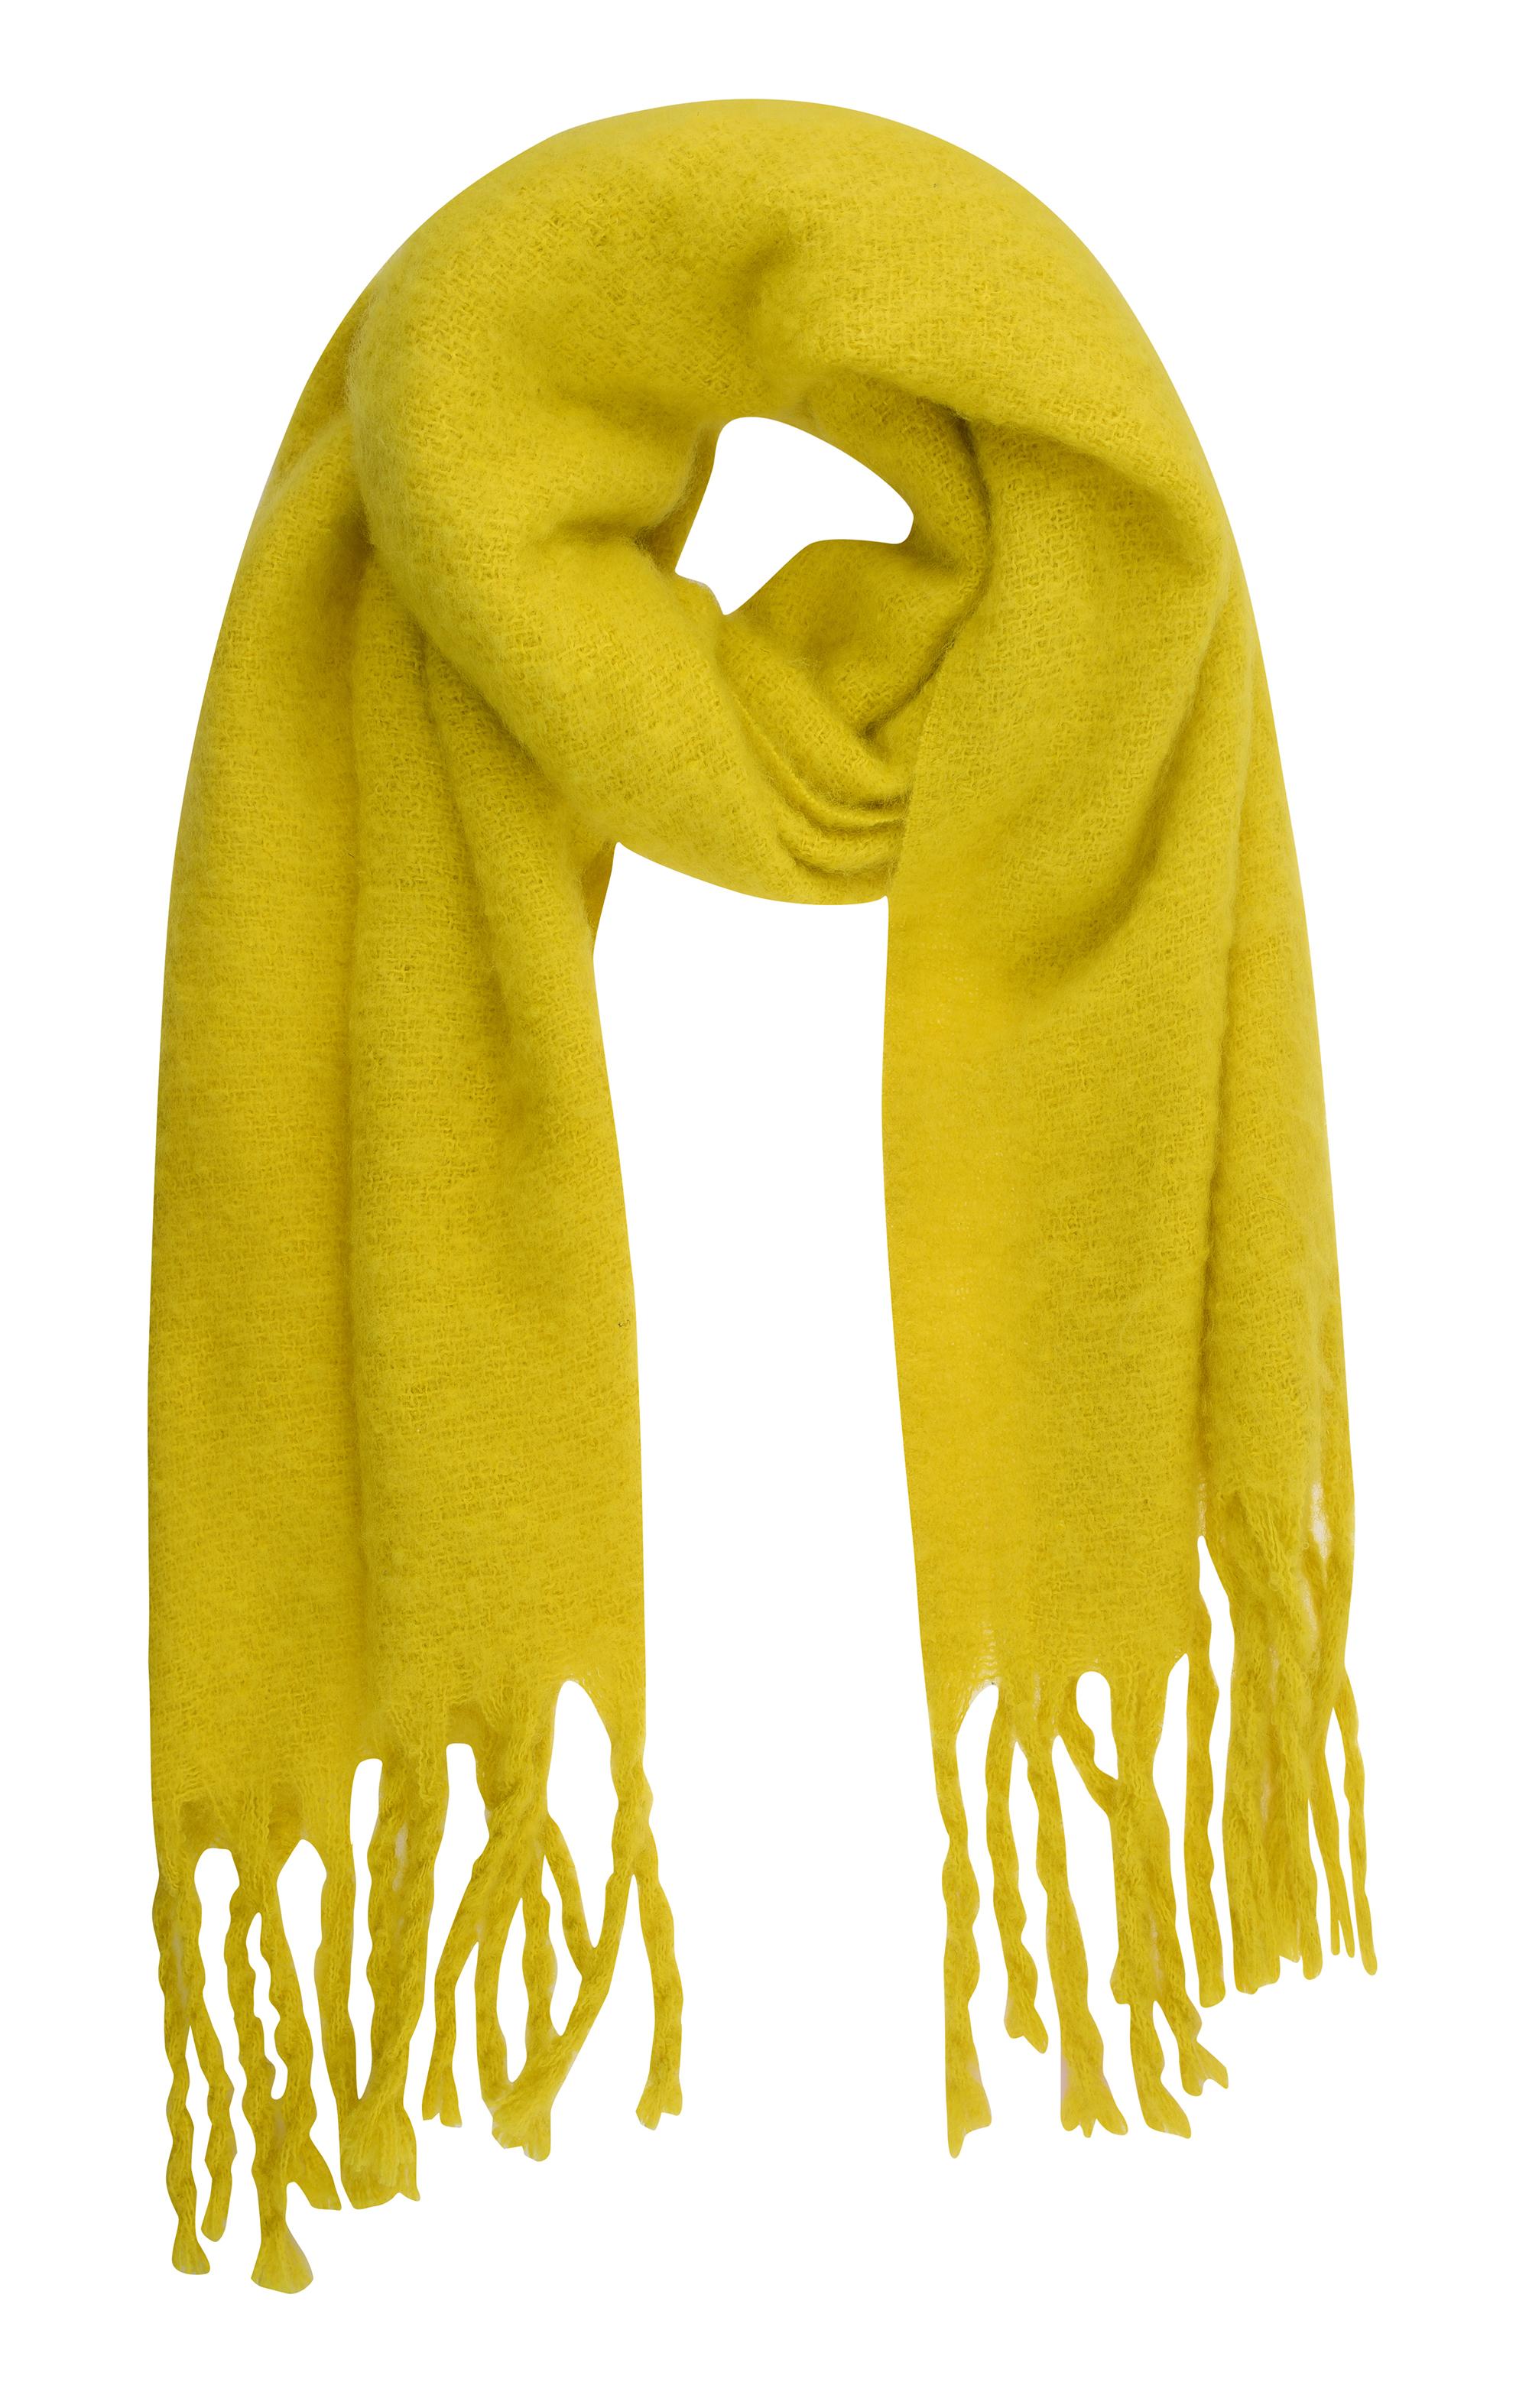 Tassel scarf, £12, Matalan